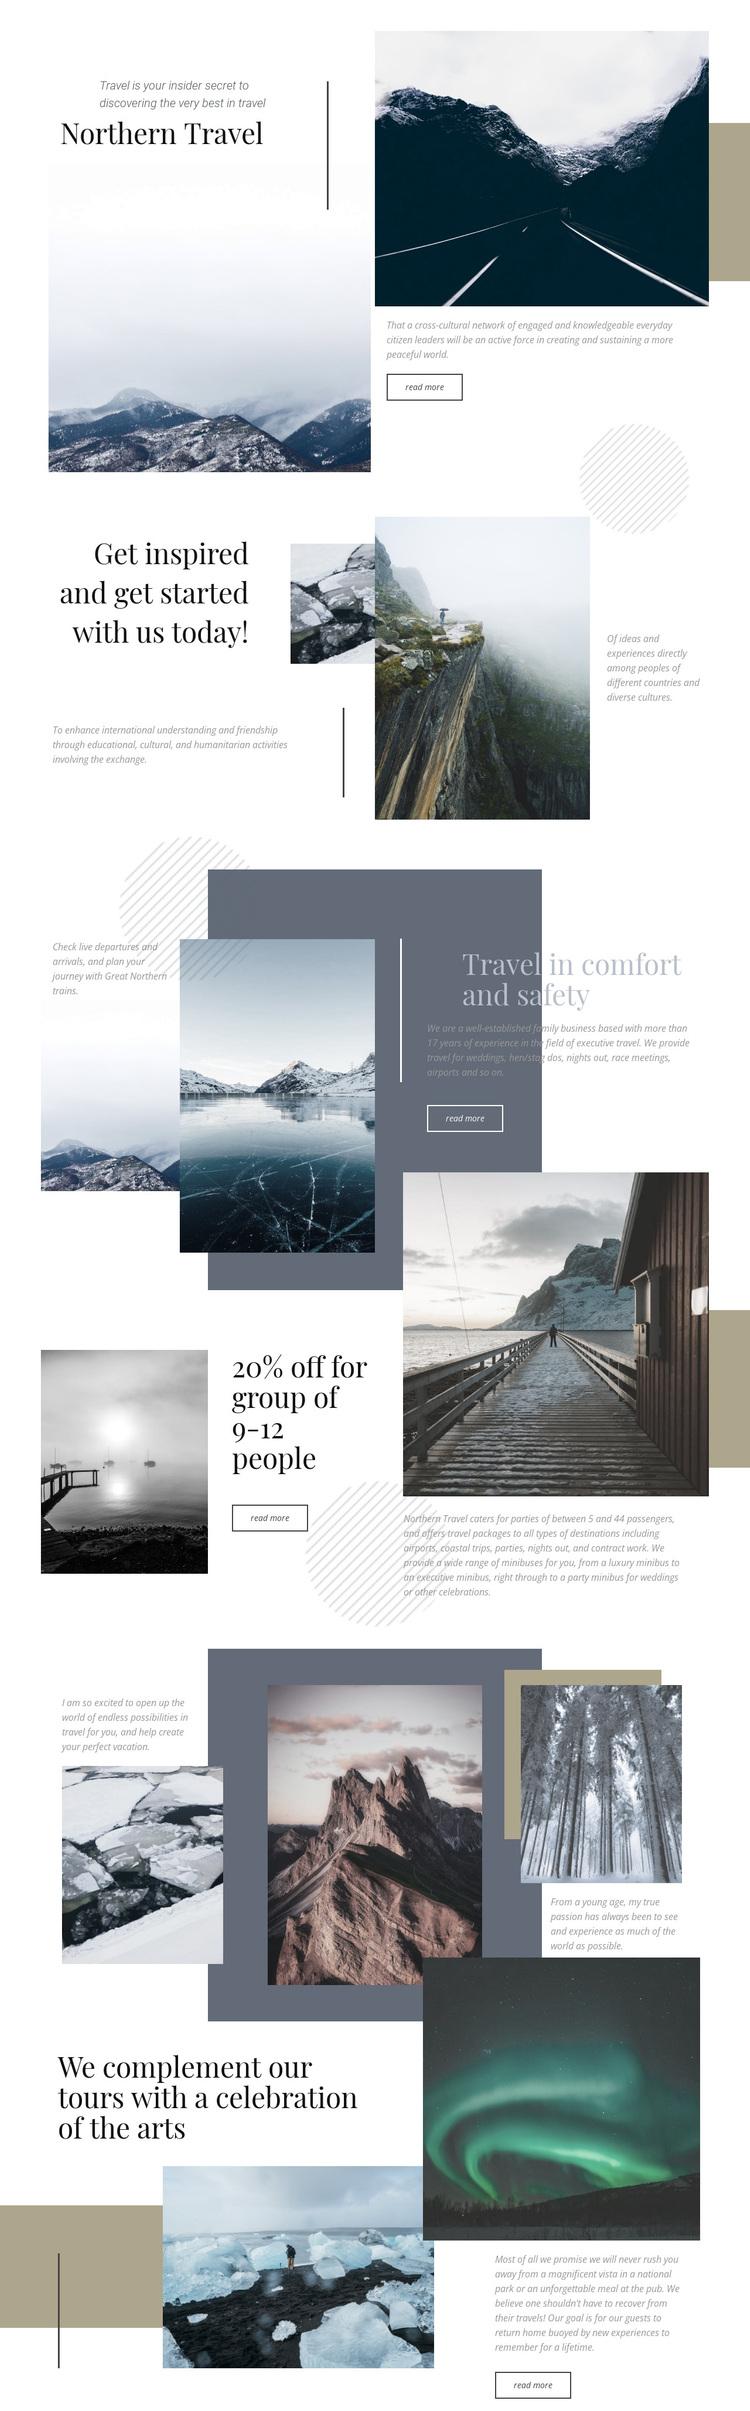 Northern Travel Joomla Page Builder